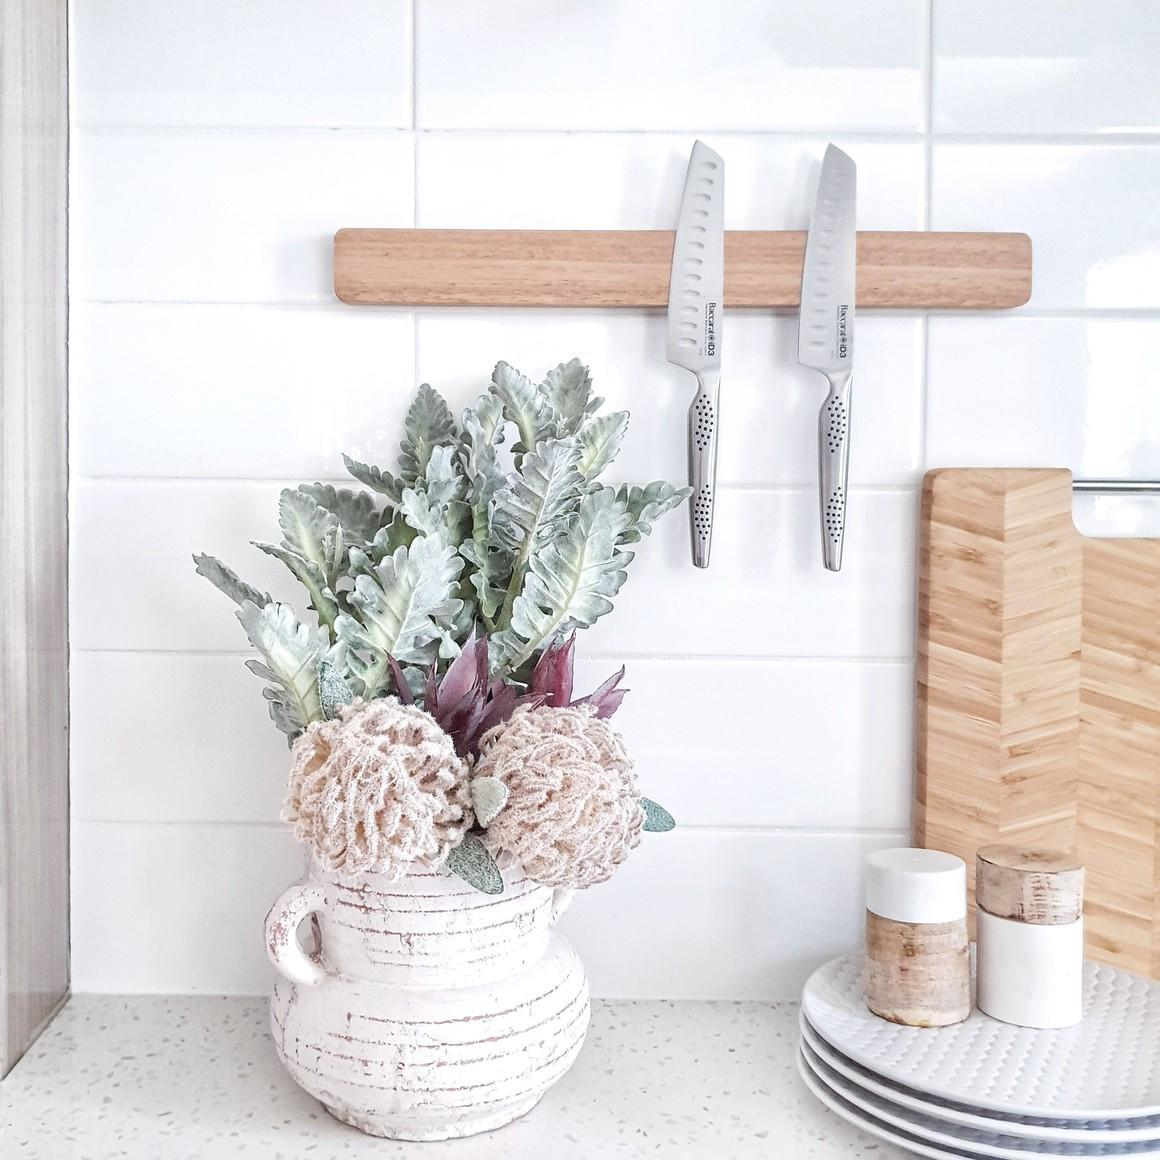 Wooden magnetic knife holder | Trada Marketplace